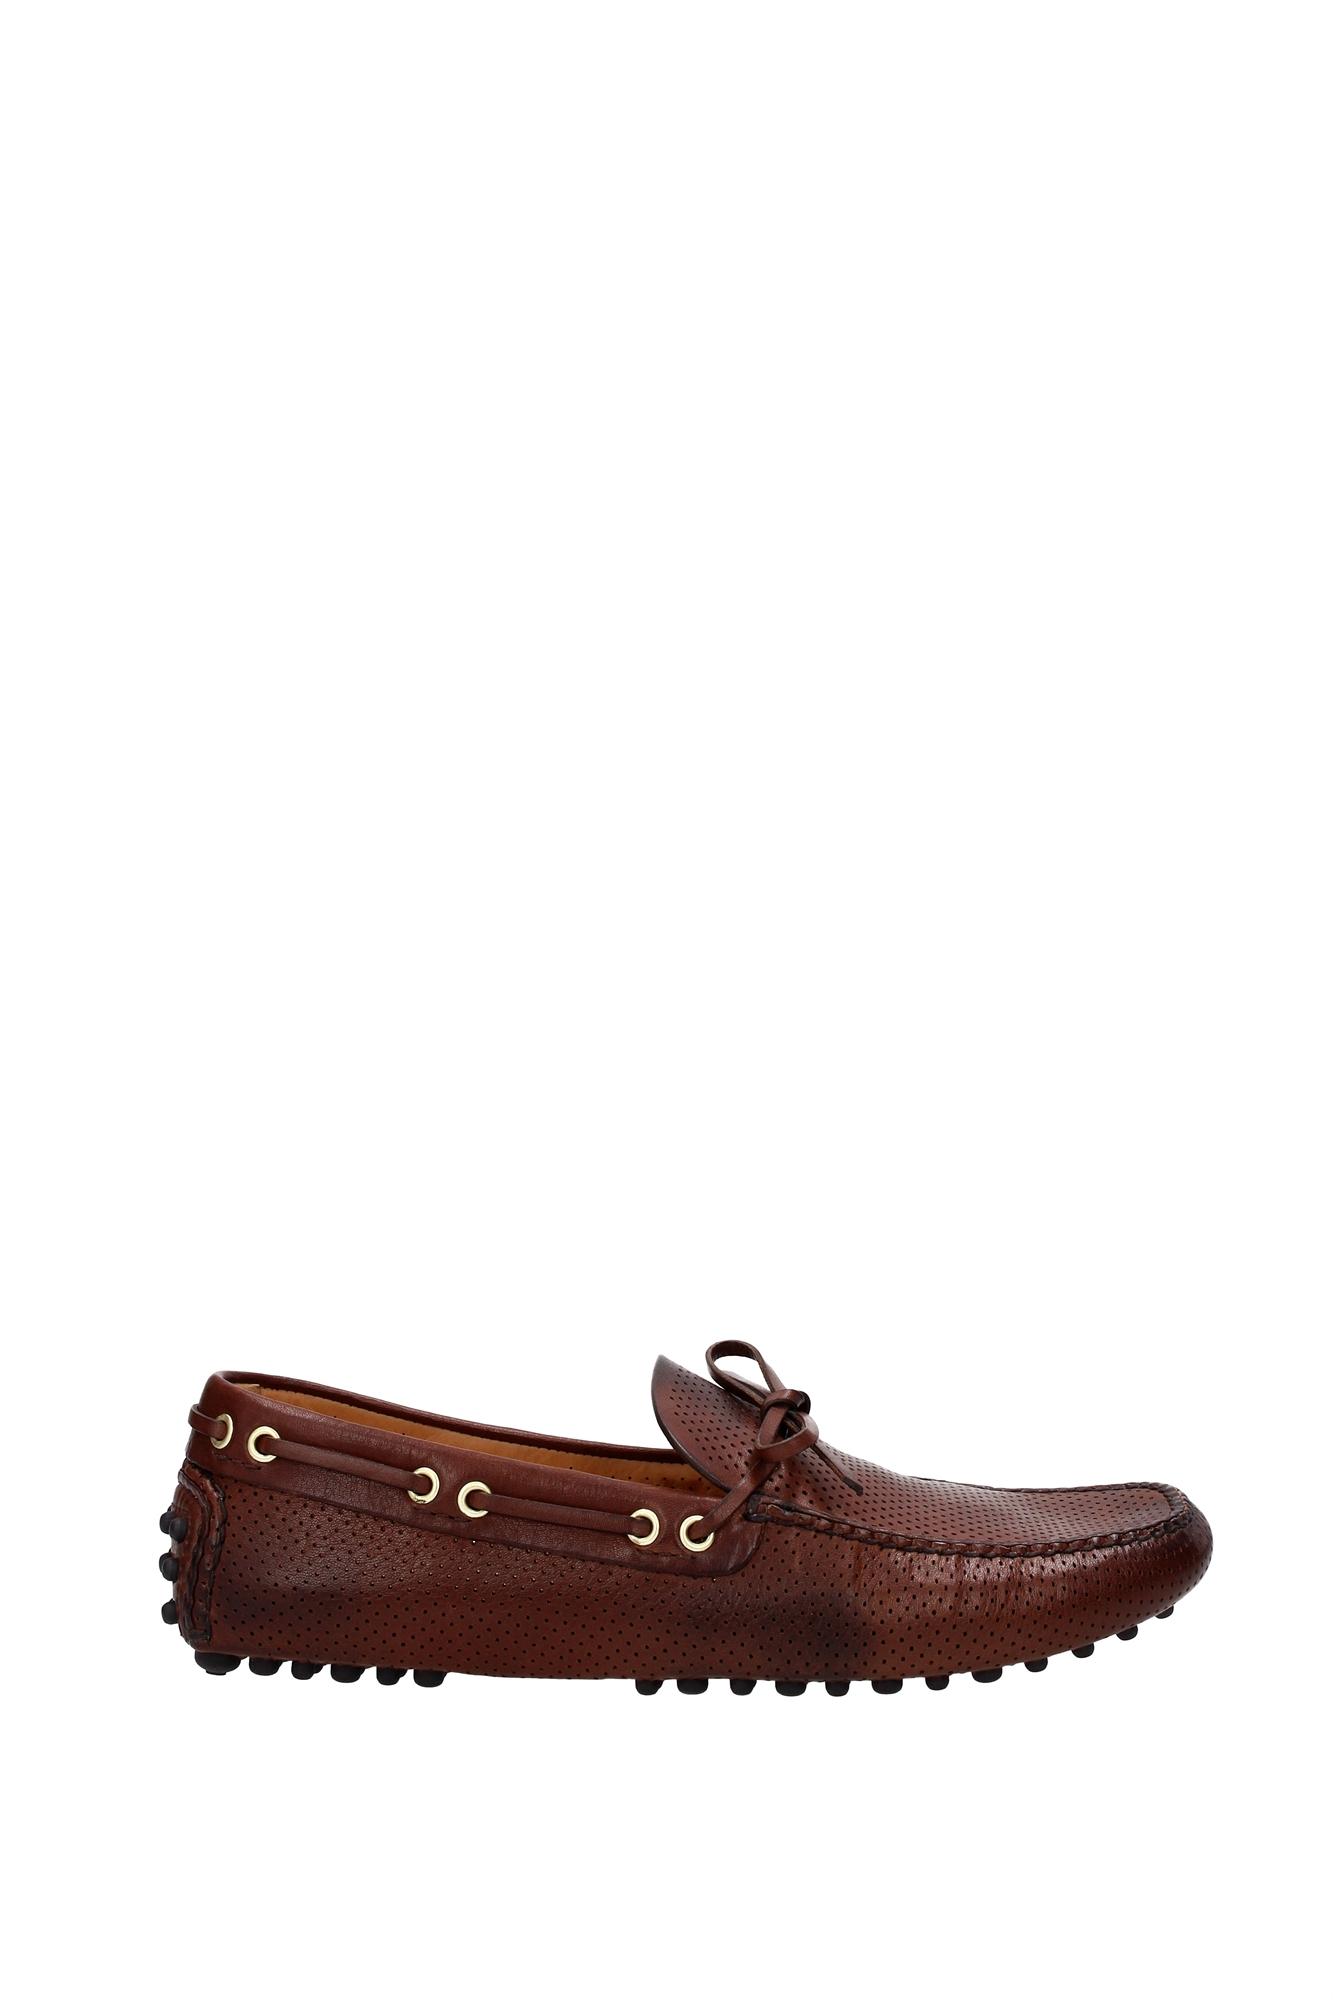 Scarpe casual da uomo  Mocassini Car Shoe uomo - (KUD 006 bruciatovintagecalffo)